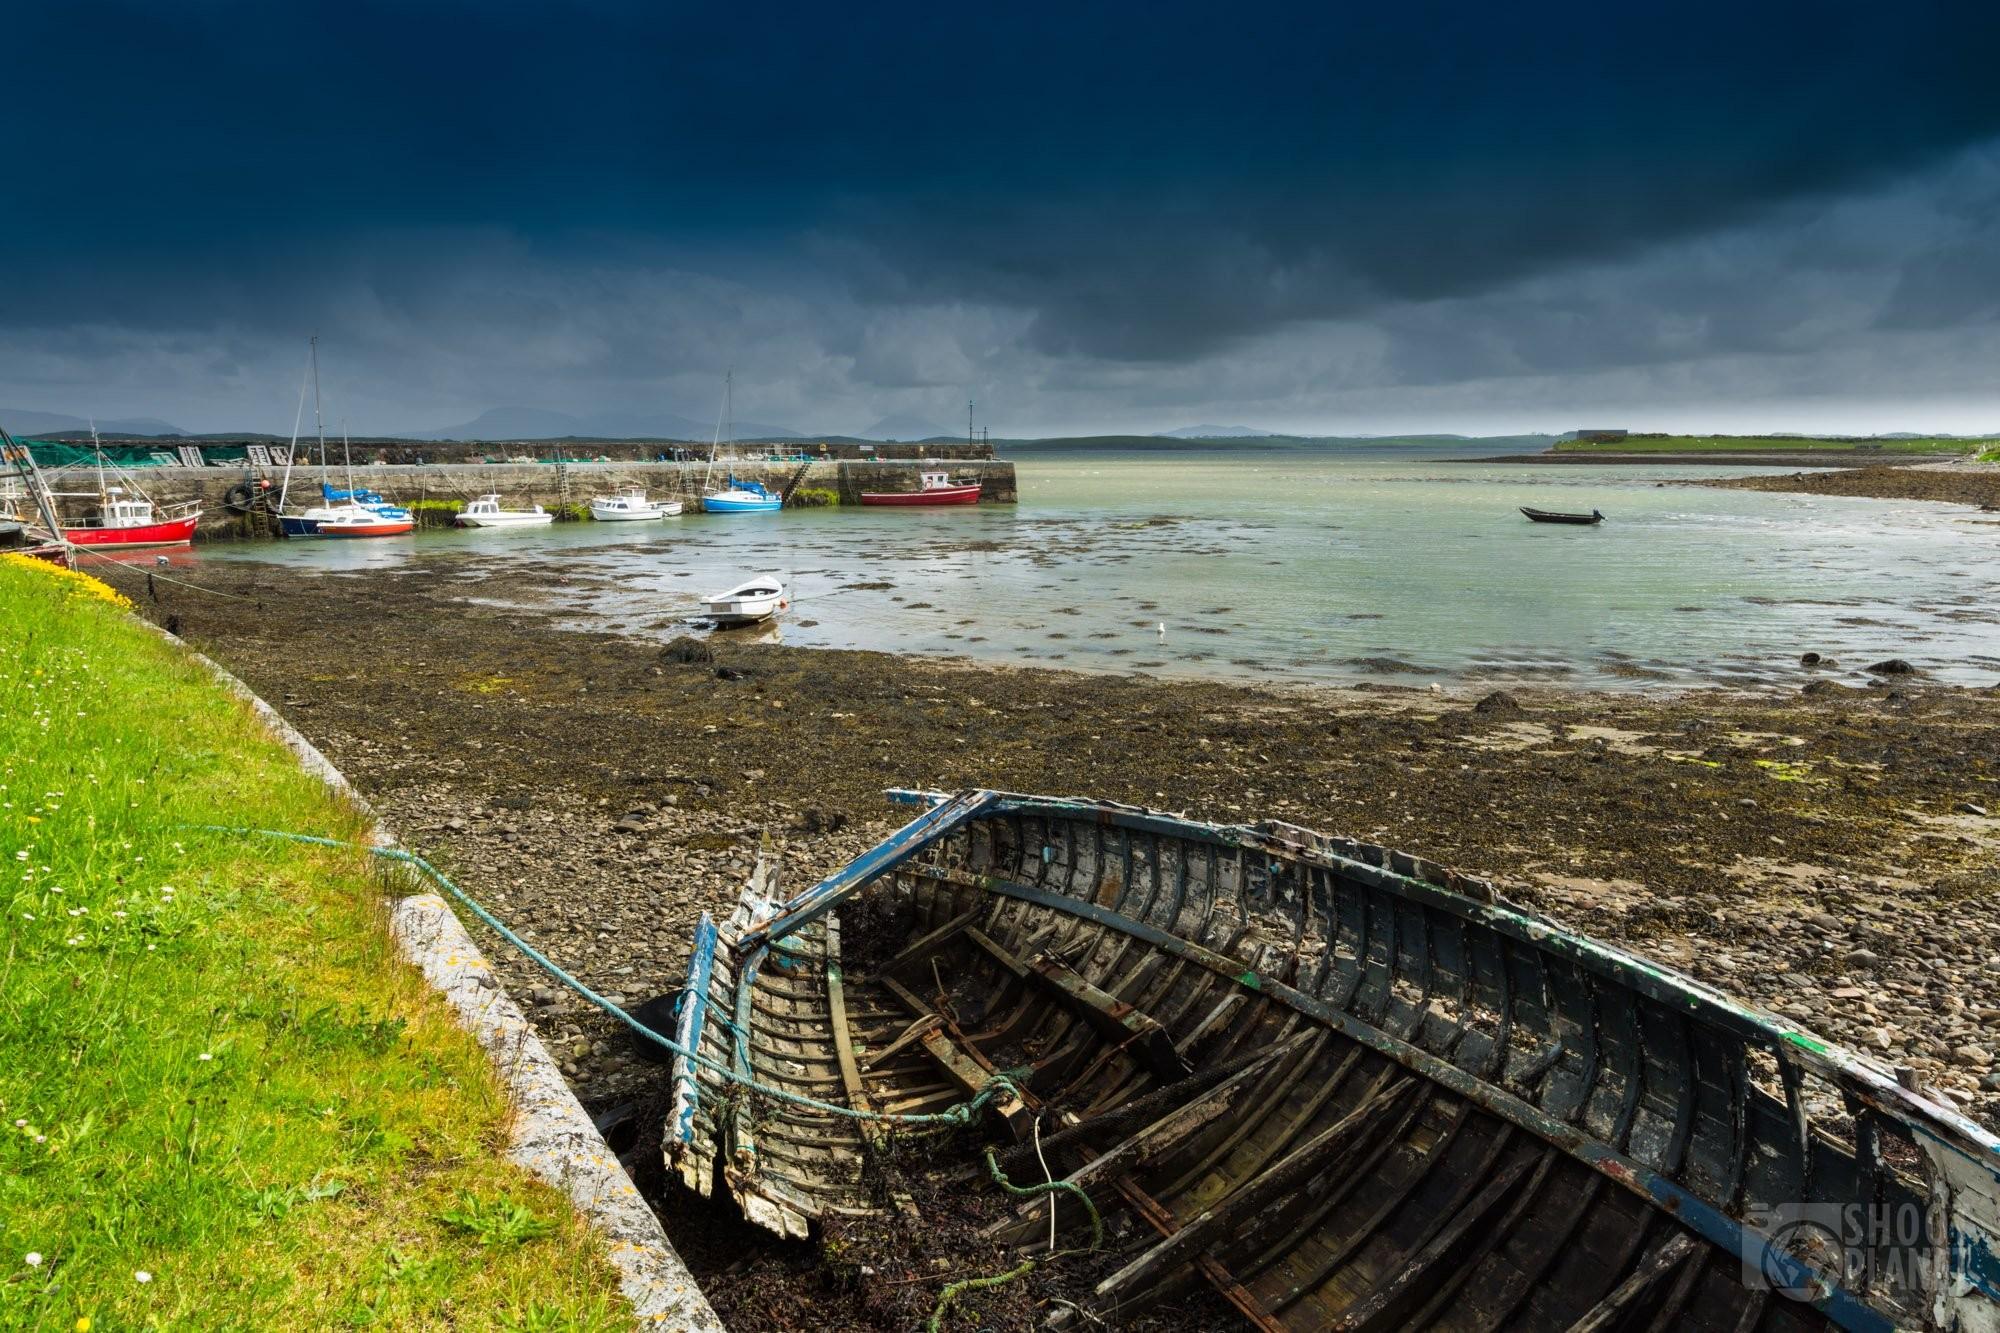 Old boat at Murrisk Pier, Ireland